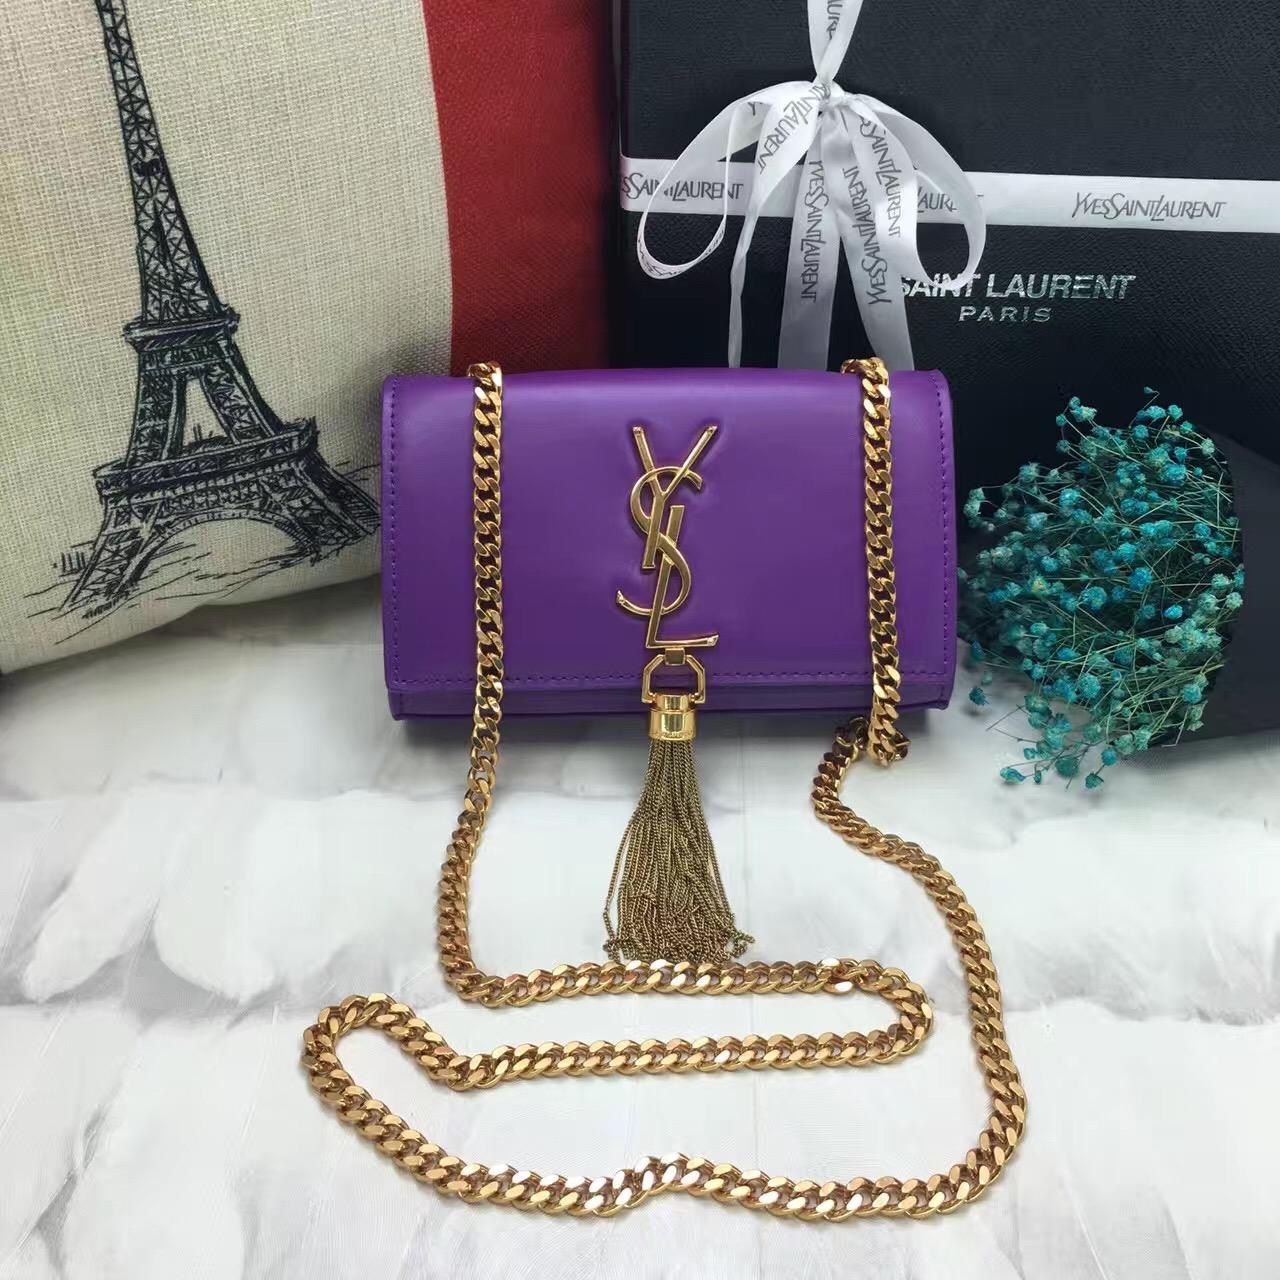 8baba82f36 YSL Small Tassel Chain Leather Bag 17cm Purple